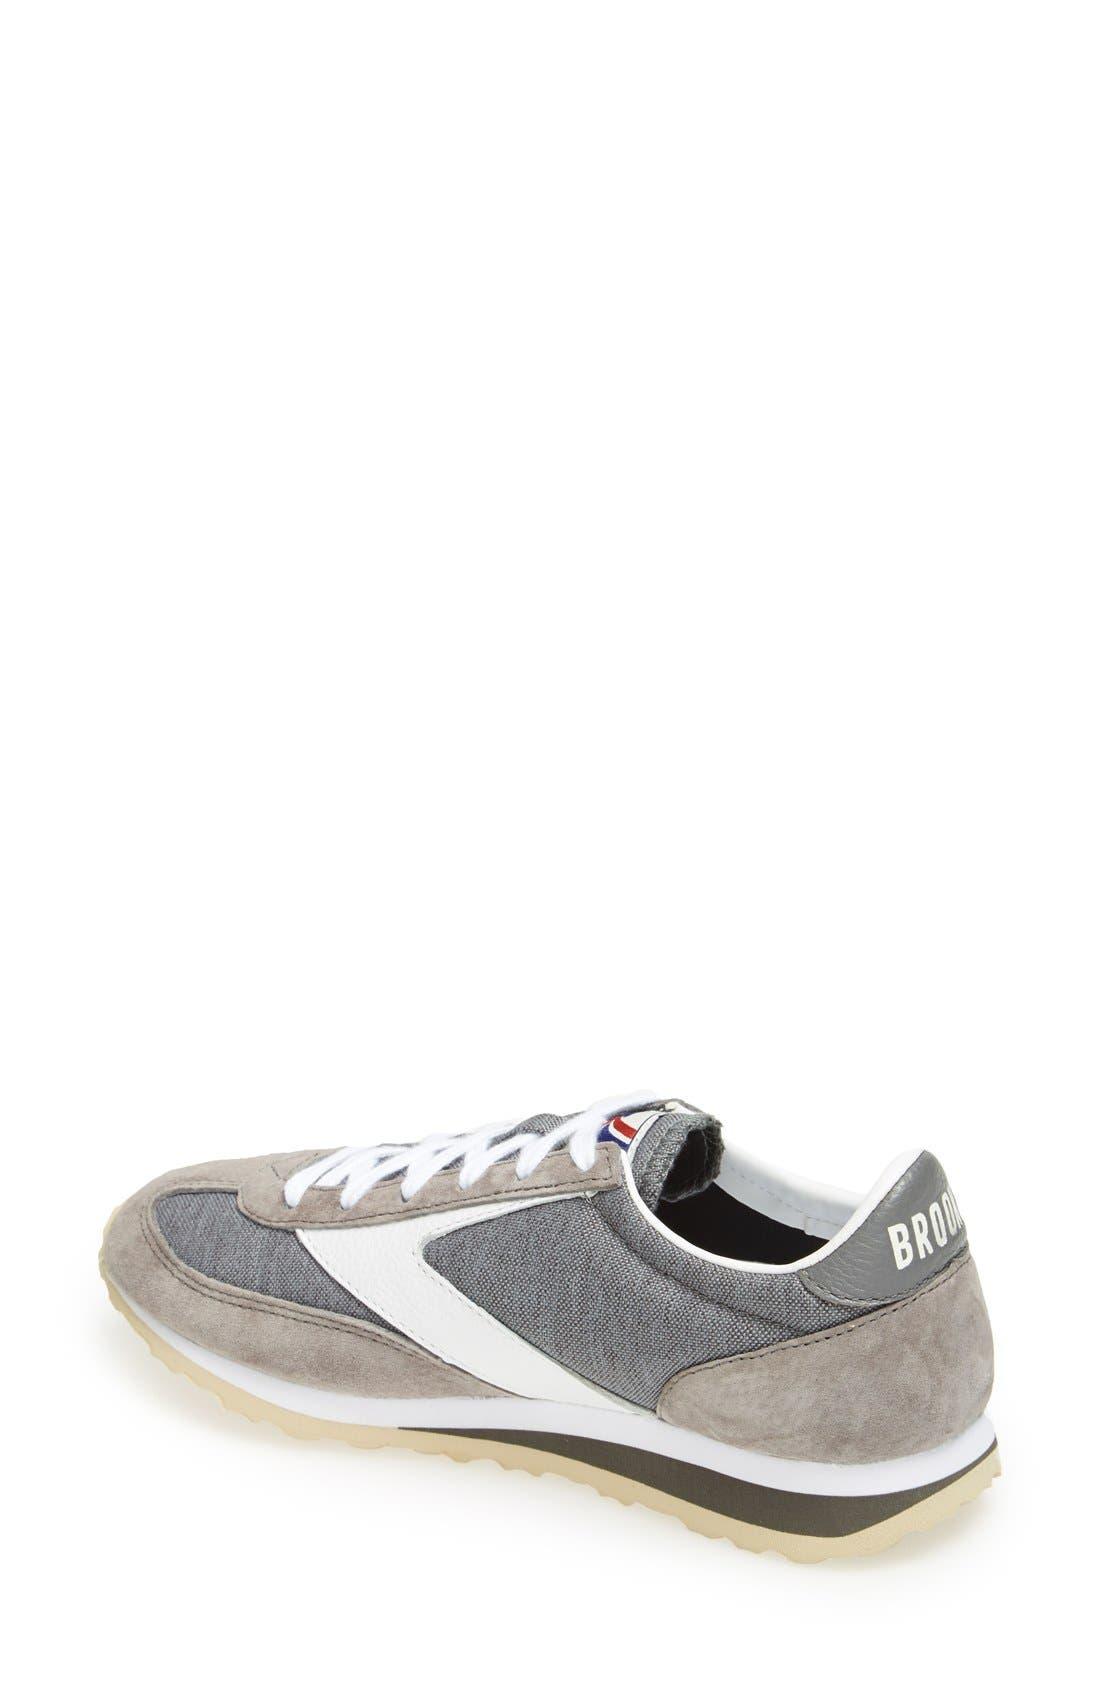 'Vanguard' Sneaker,                             Alternate thumbnail 56, color,